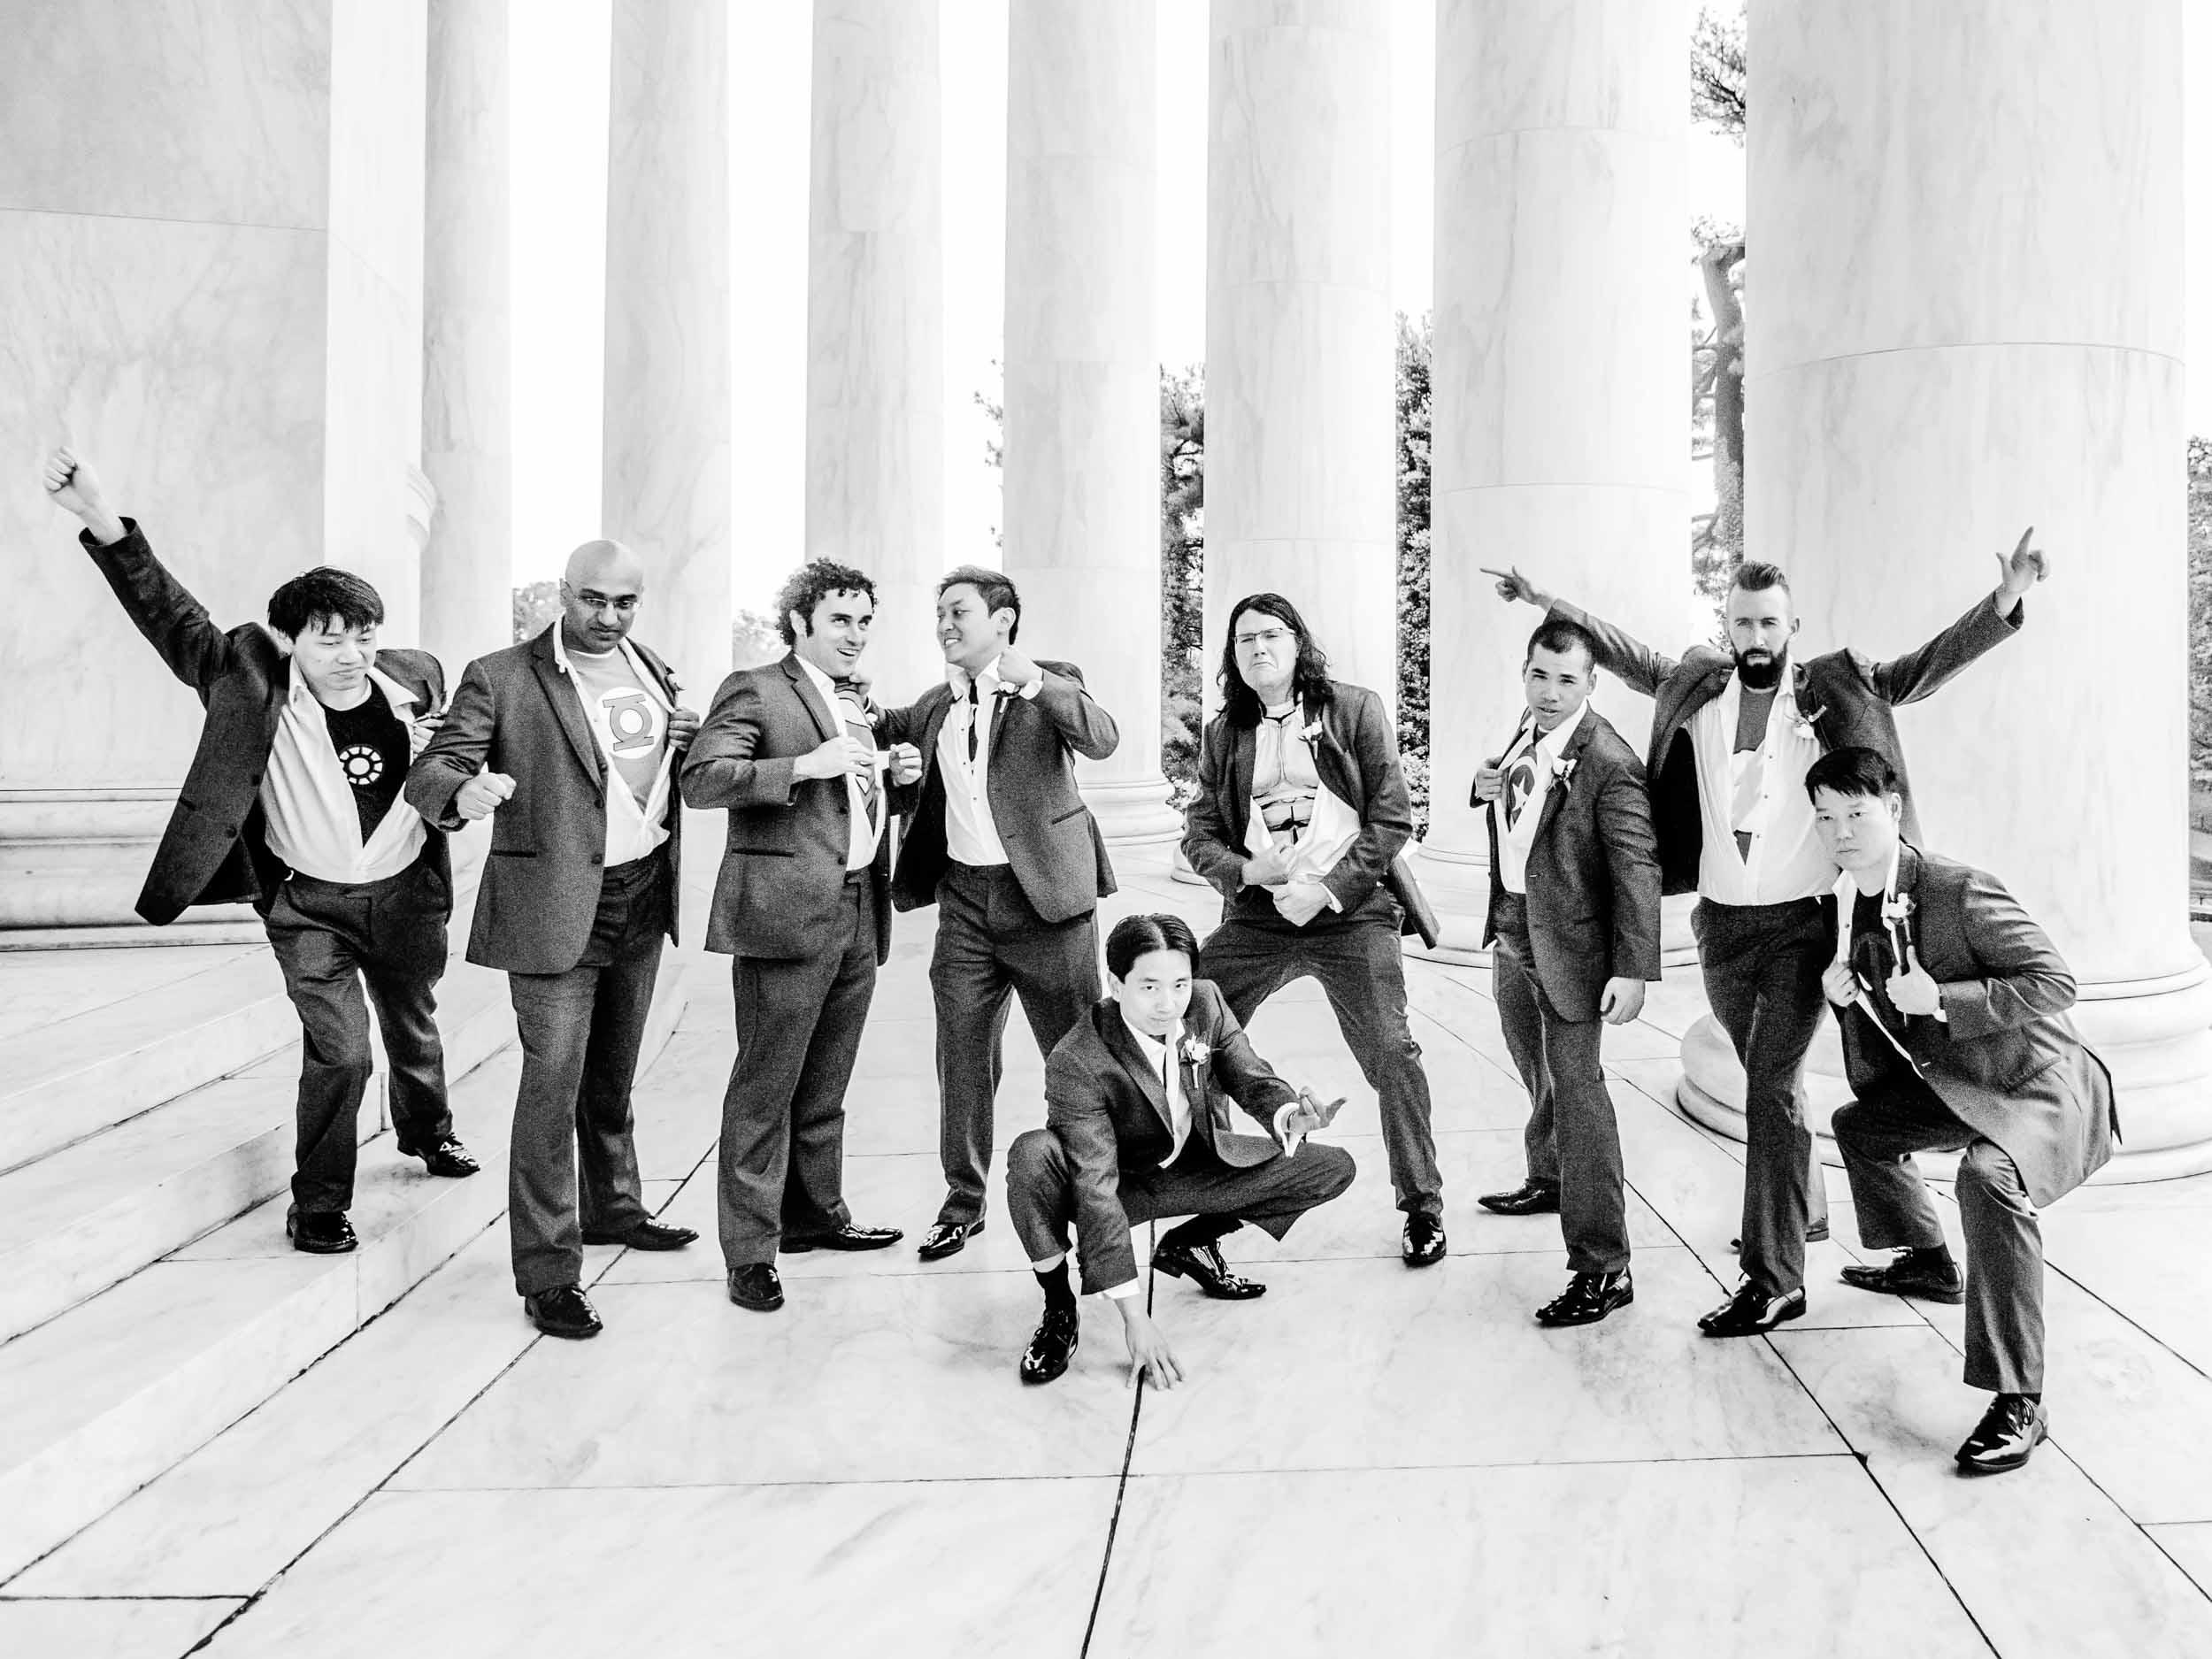 dc+metro+wedding+photographer+vadym+guliuk+photography+weddings+groomsmen-2023.jpg